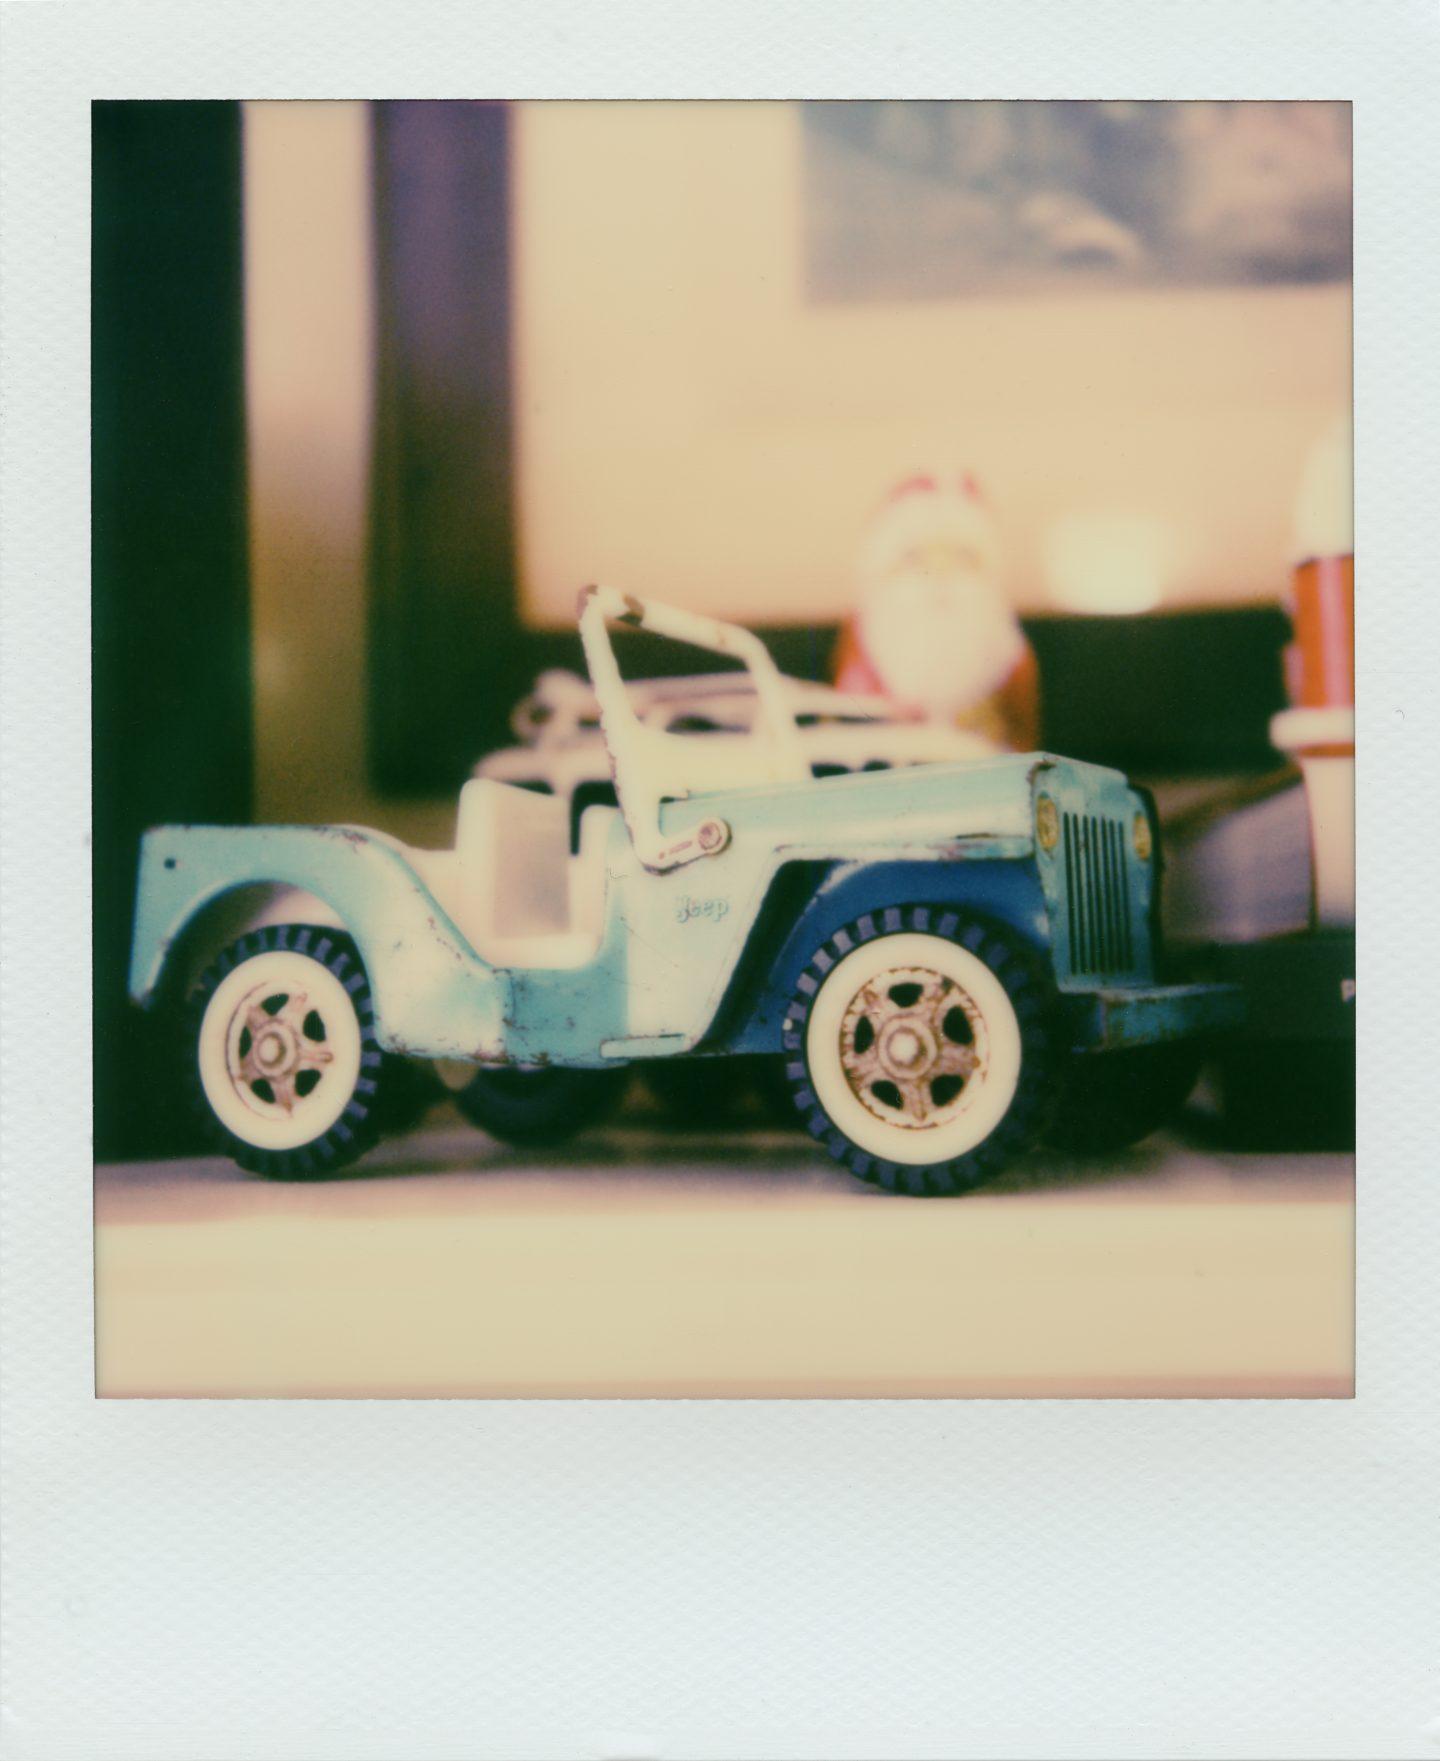 365-9 SX-70 Polaroid Instant Camera